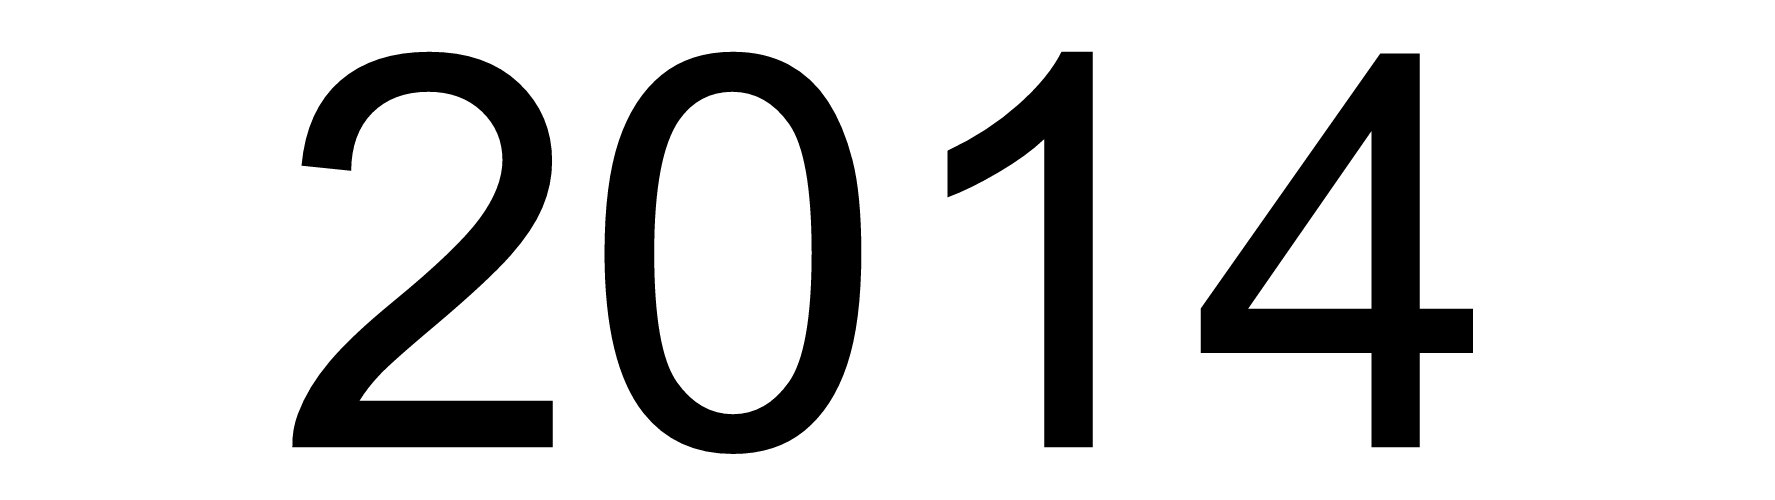 2014-logo-black.png